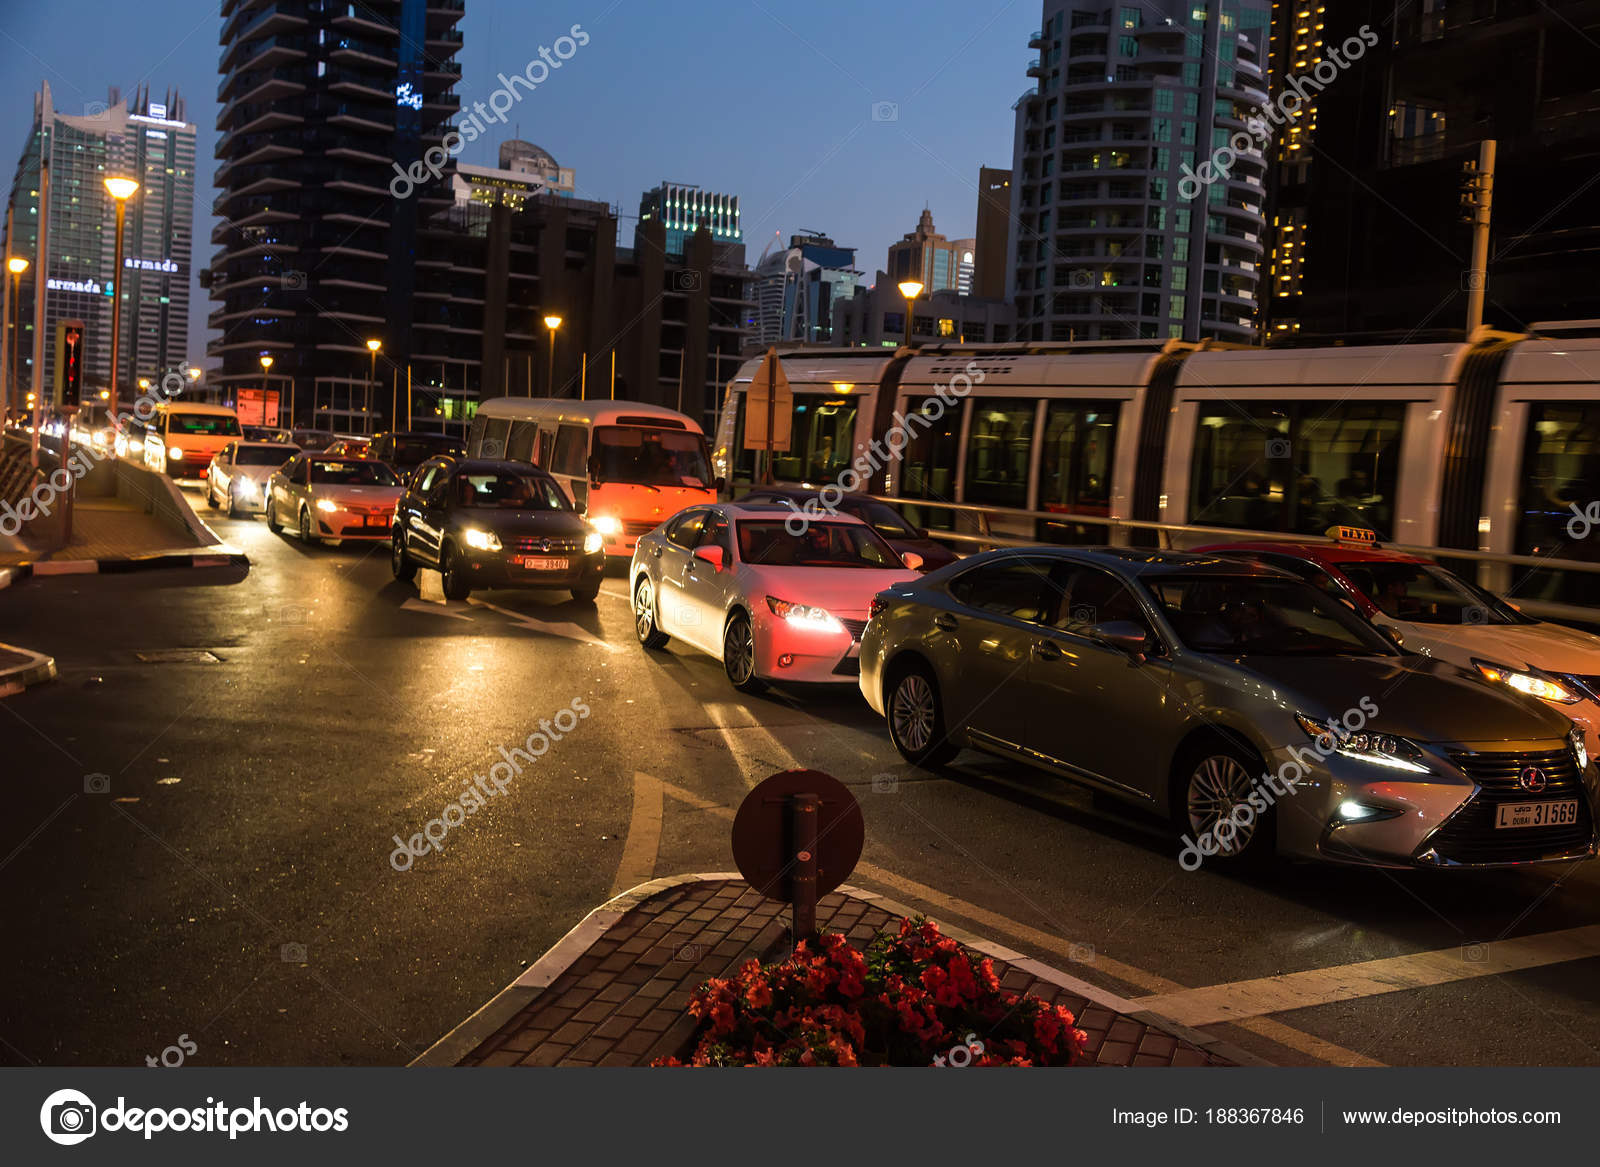 Dubai Uae February 2018 Cars Evening Traffic Jam Streets Modern Stock Editorial Photo C Endewer1 Mail Ru 188367846